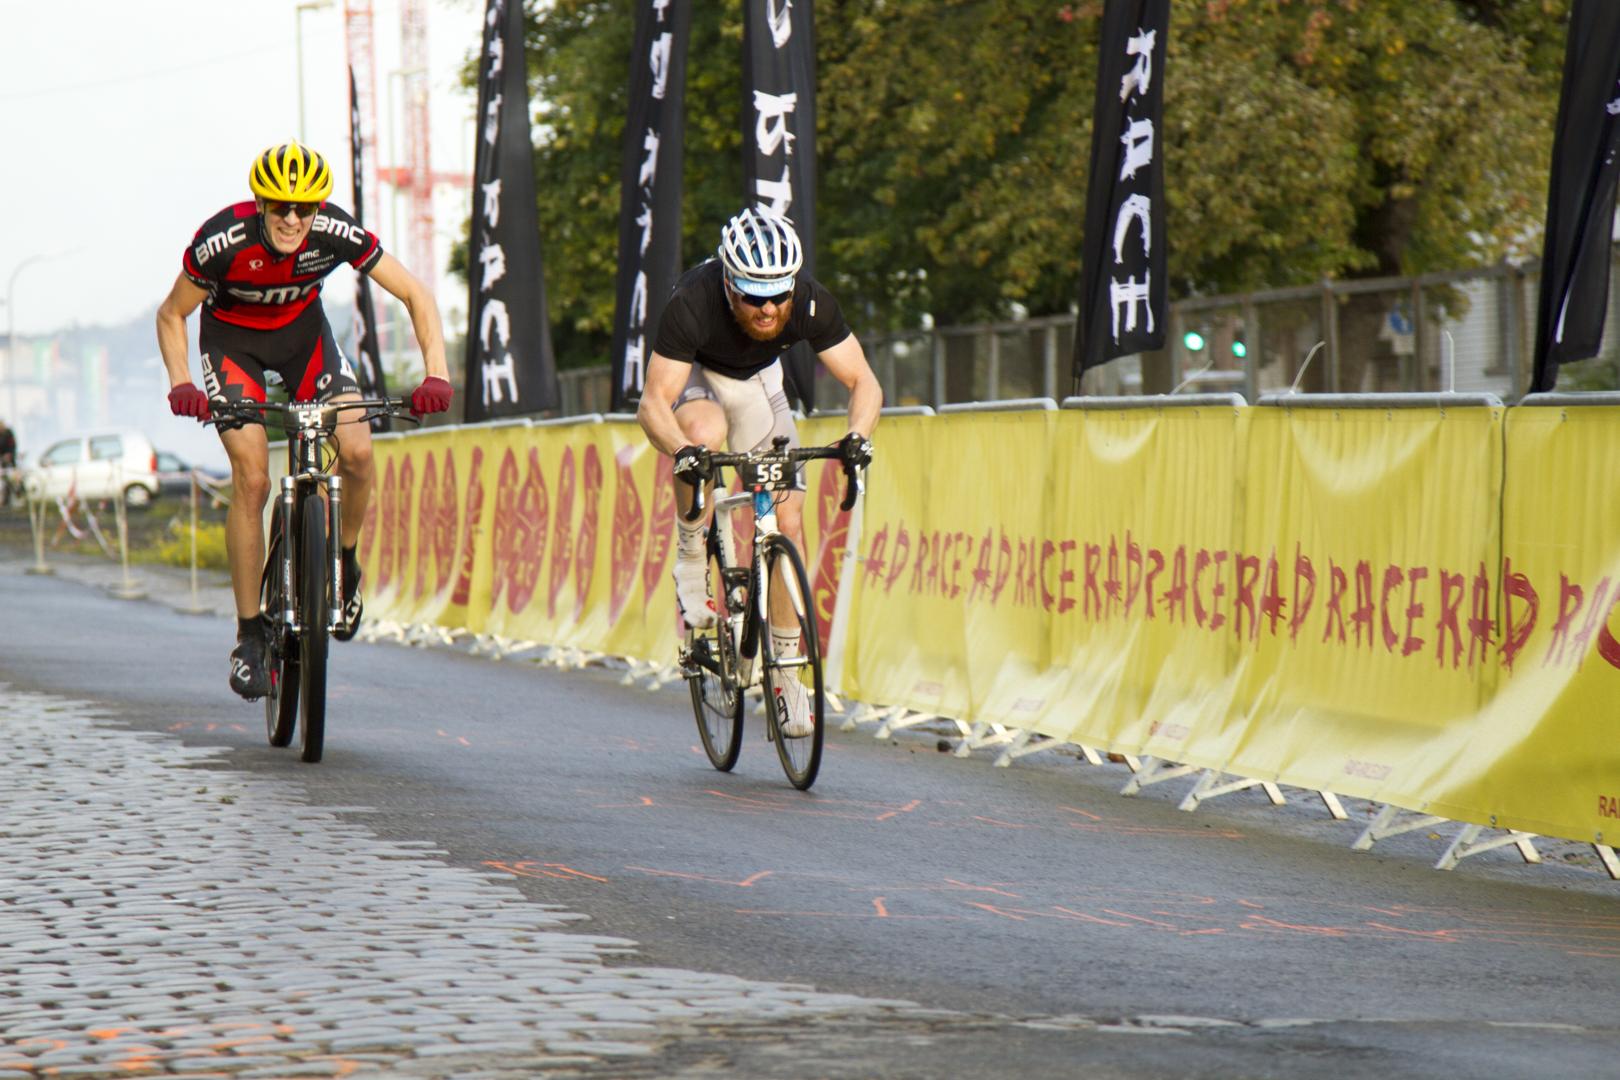 RadRace-Battle-Offenbach-2014-8370.jpg